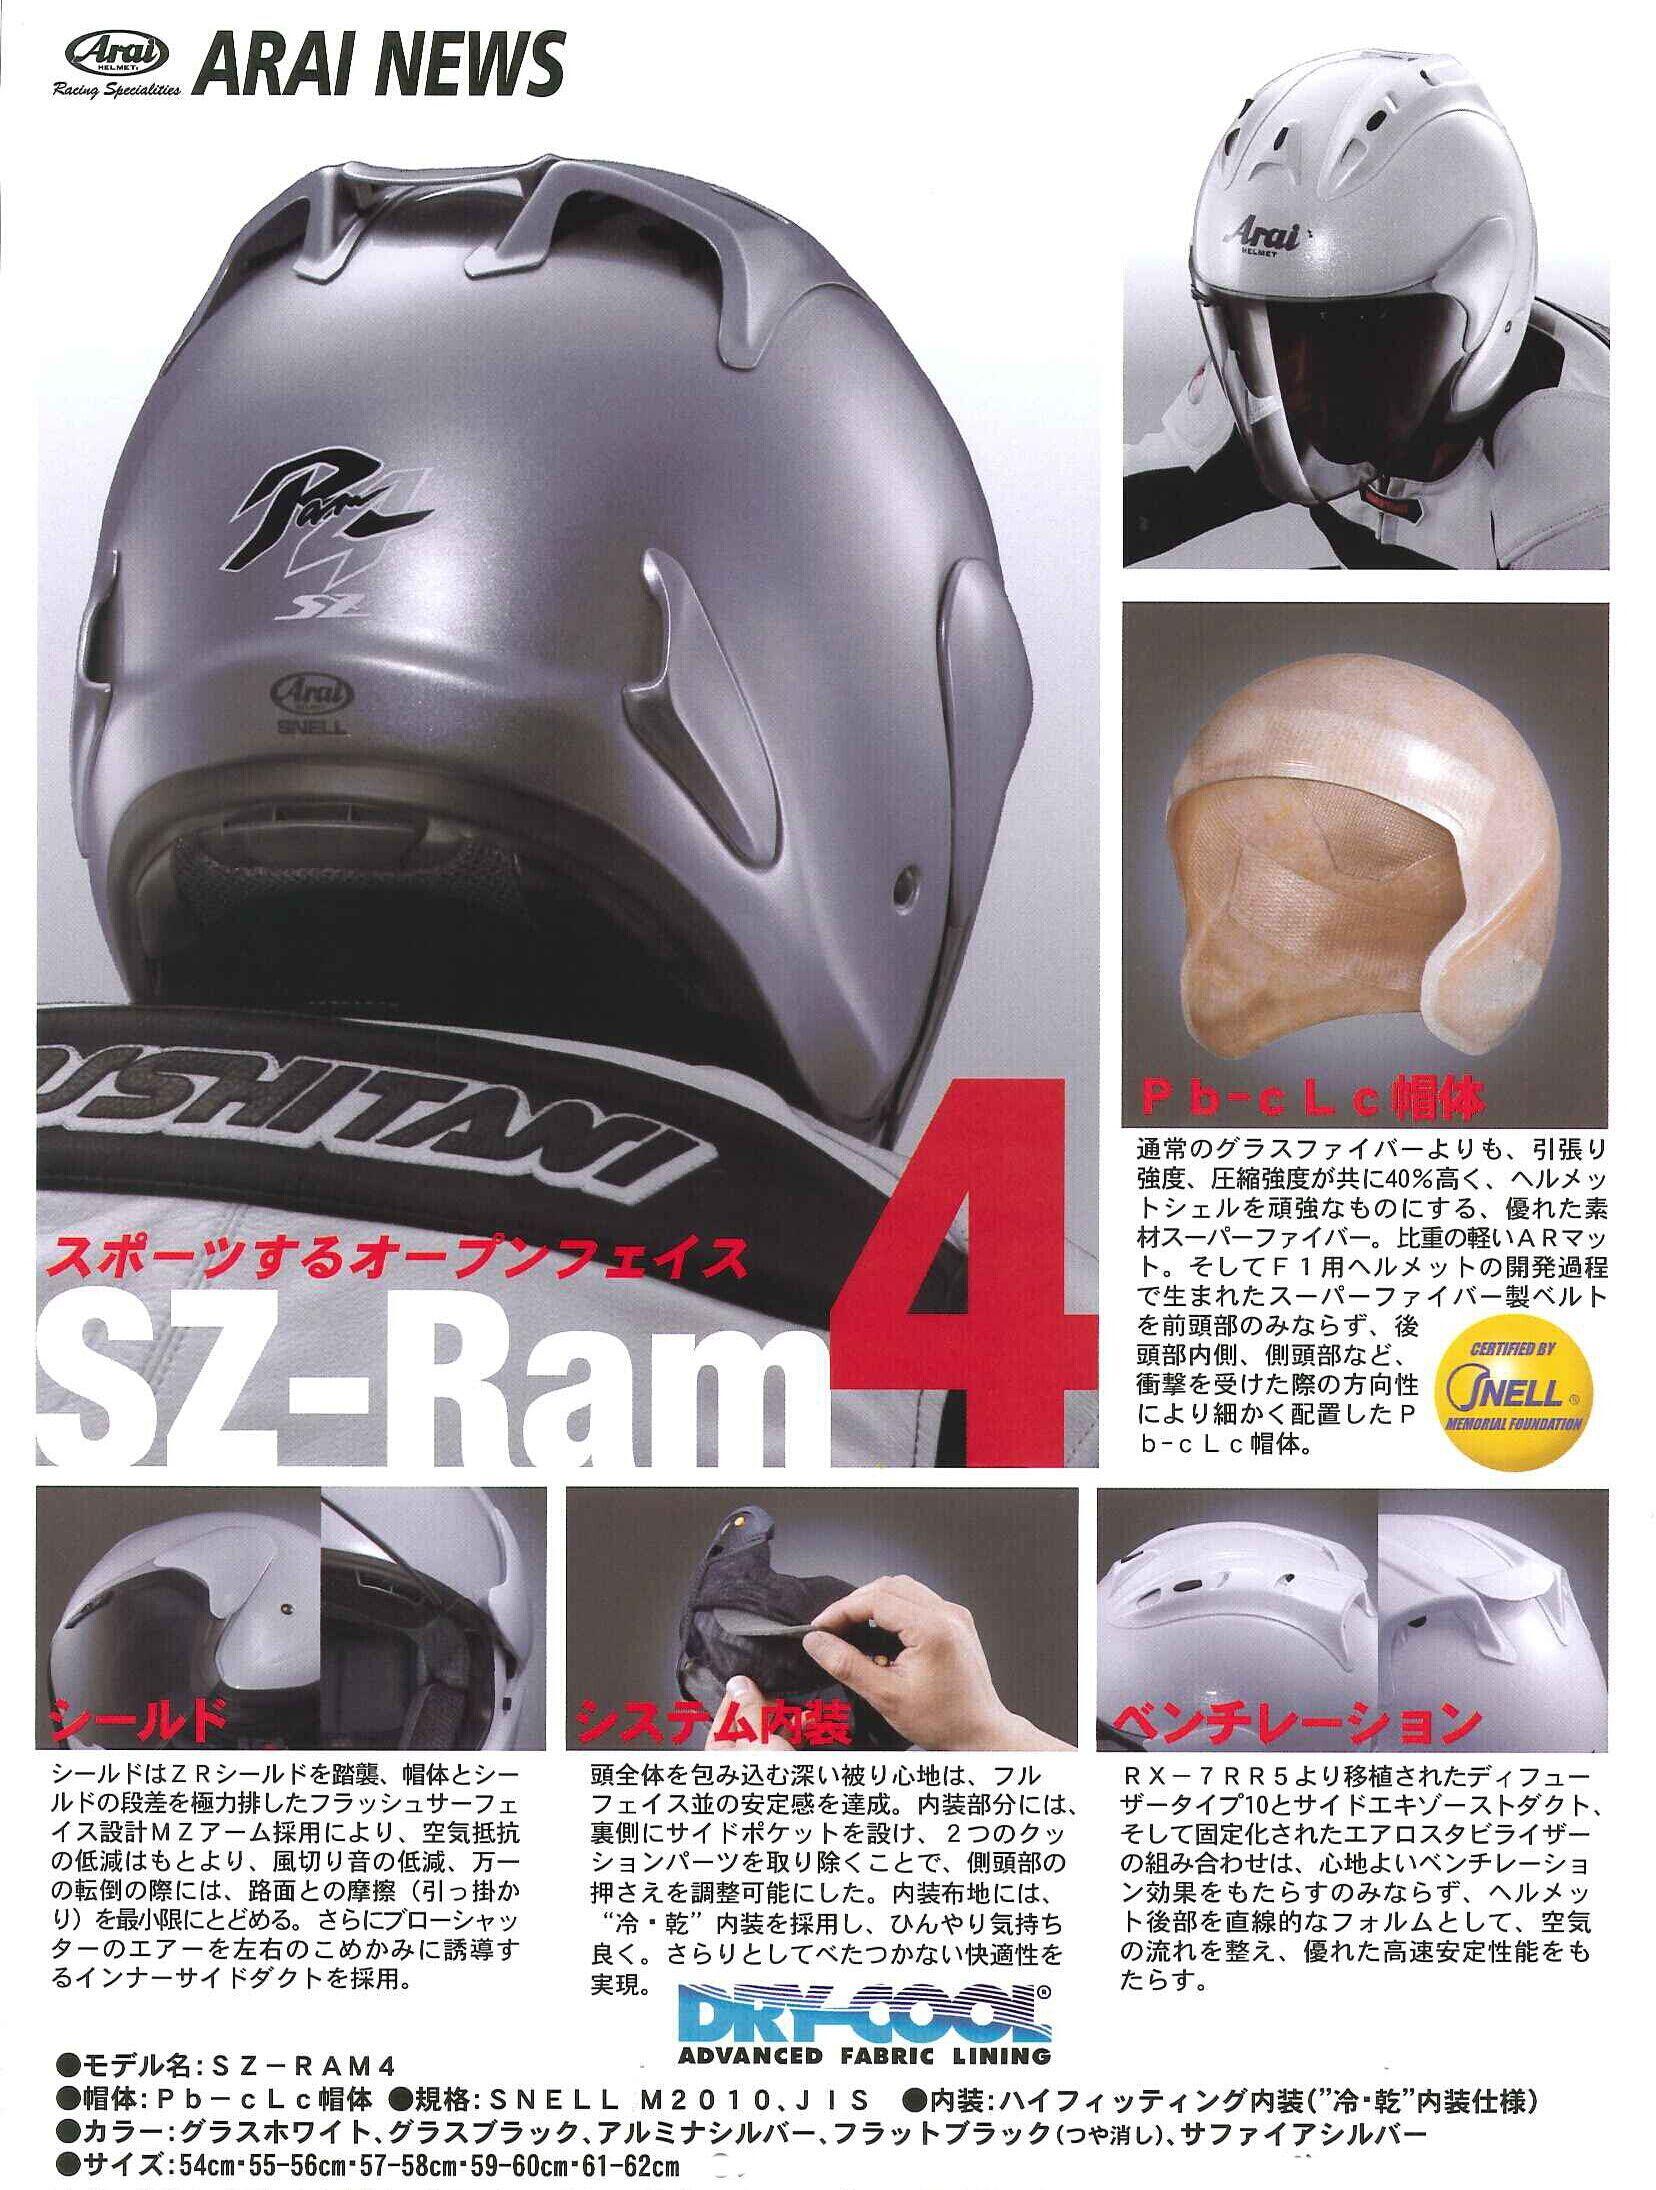 【Arai】SZ-RAM4 UPTOWN 安全帽 - 「Webike-摩托百貨」